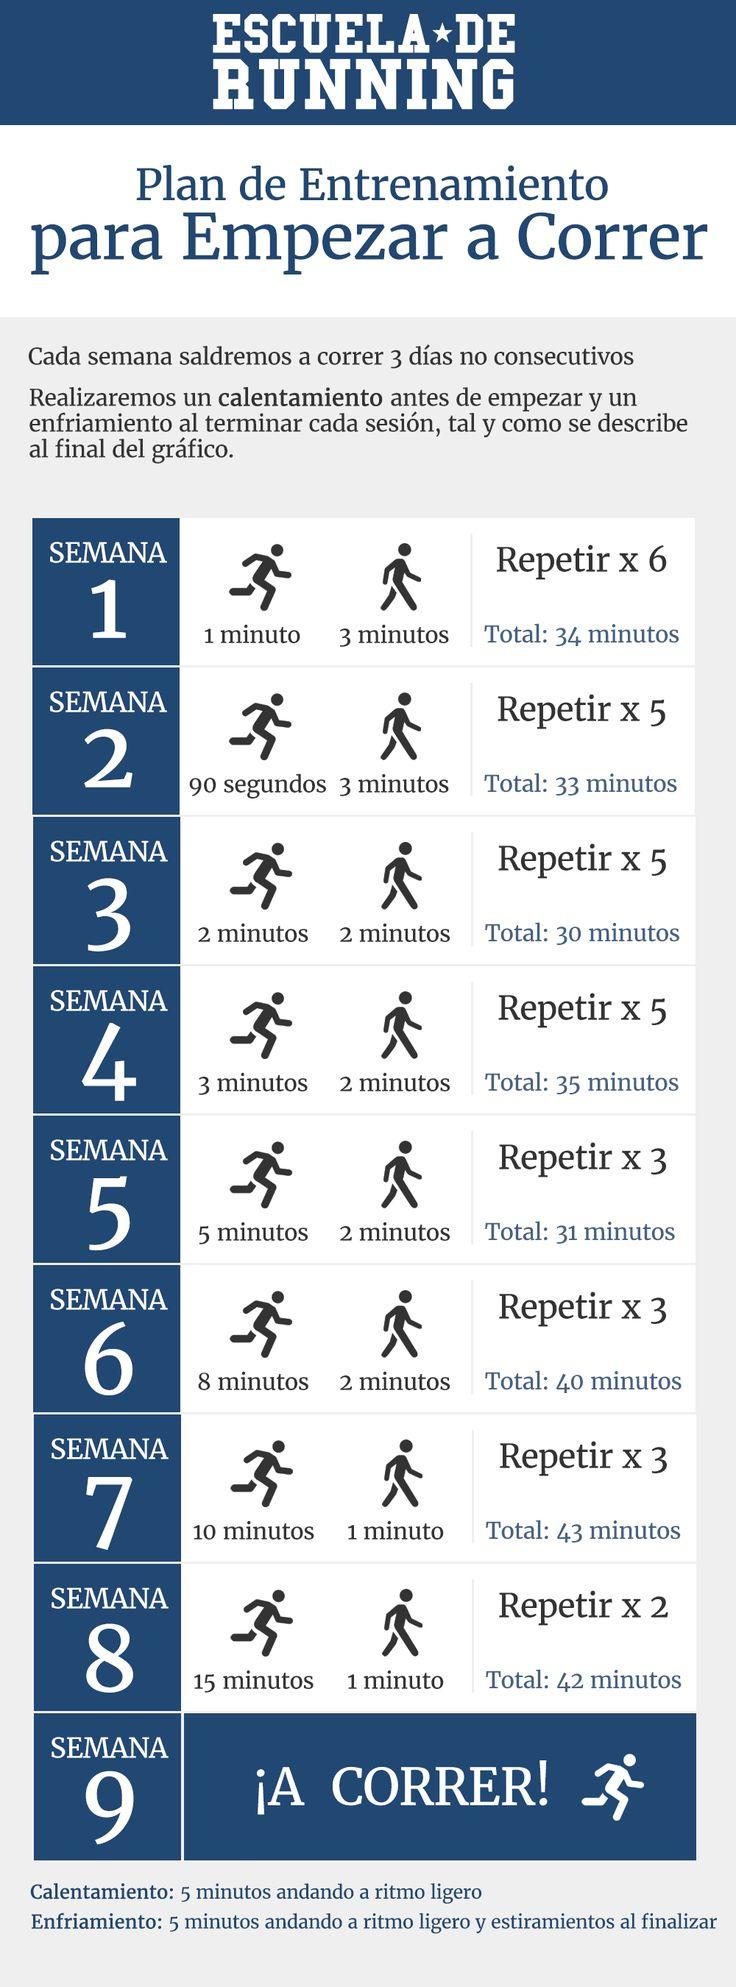 Plan de Entrenamiento para empezar a #correr desde cero #running